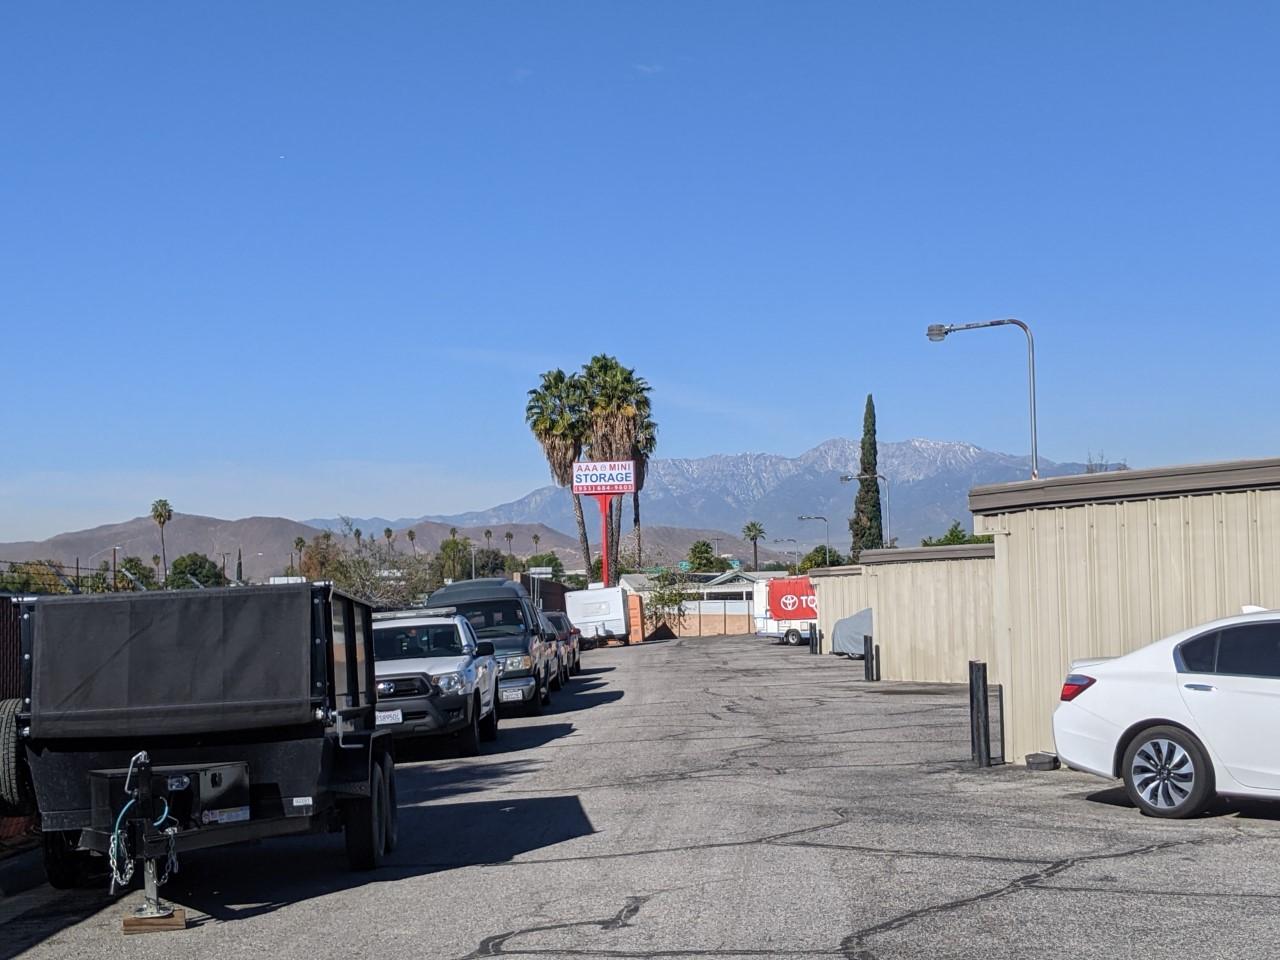 Storage and RV Parking in Riverside, CA 92507